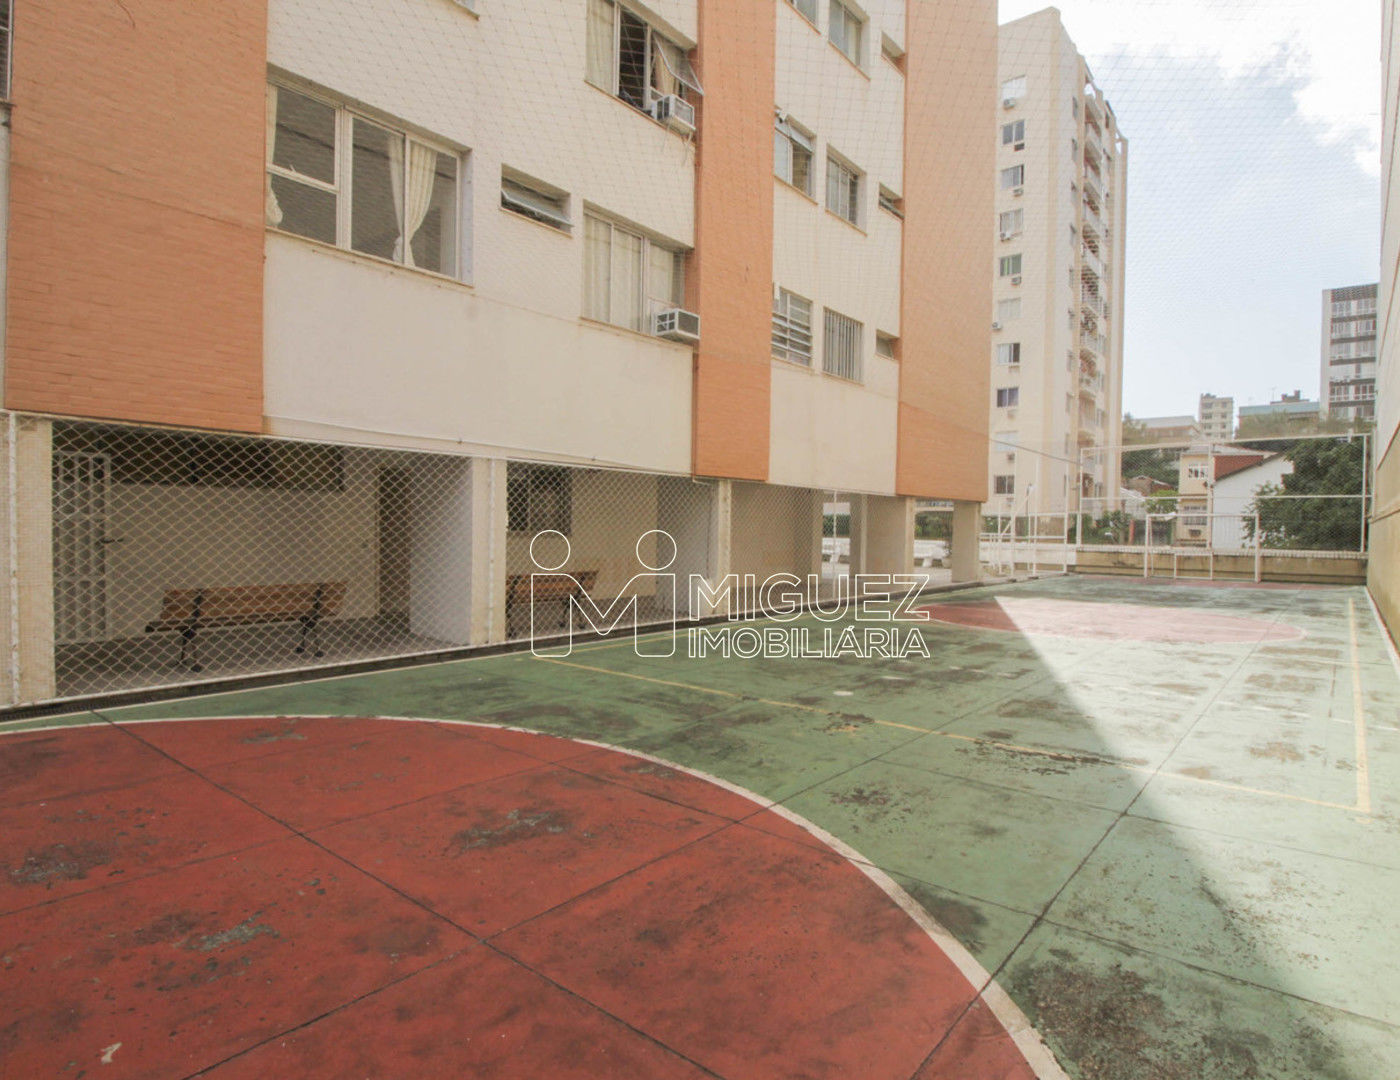 Cobertura, venda, Rua General Roca - Tijuca , Rio de janeiro